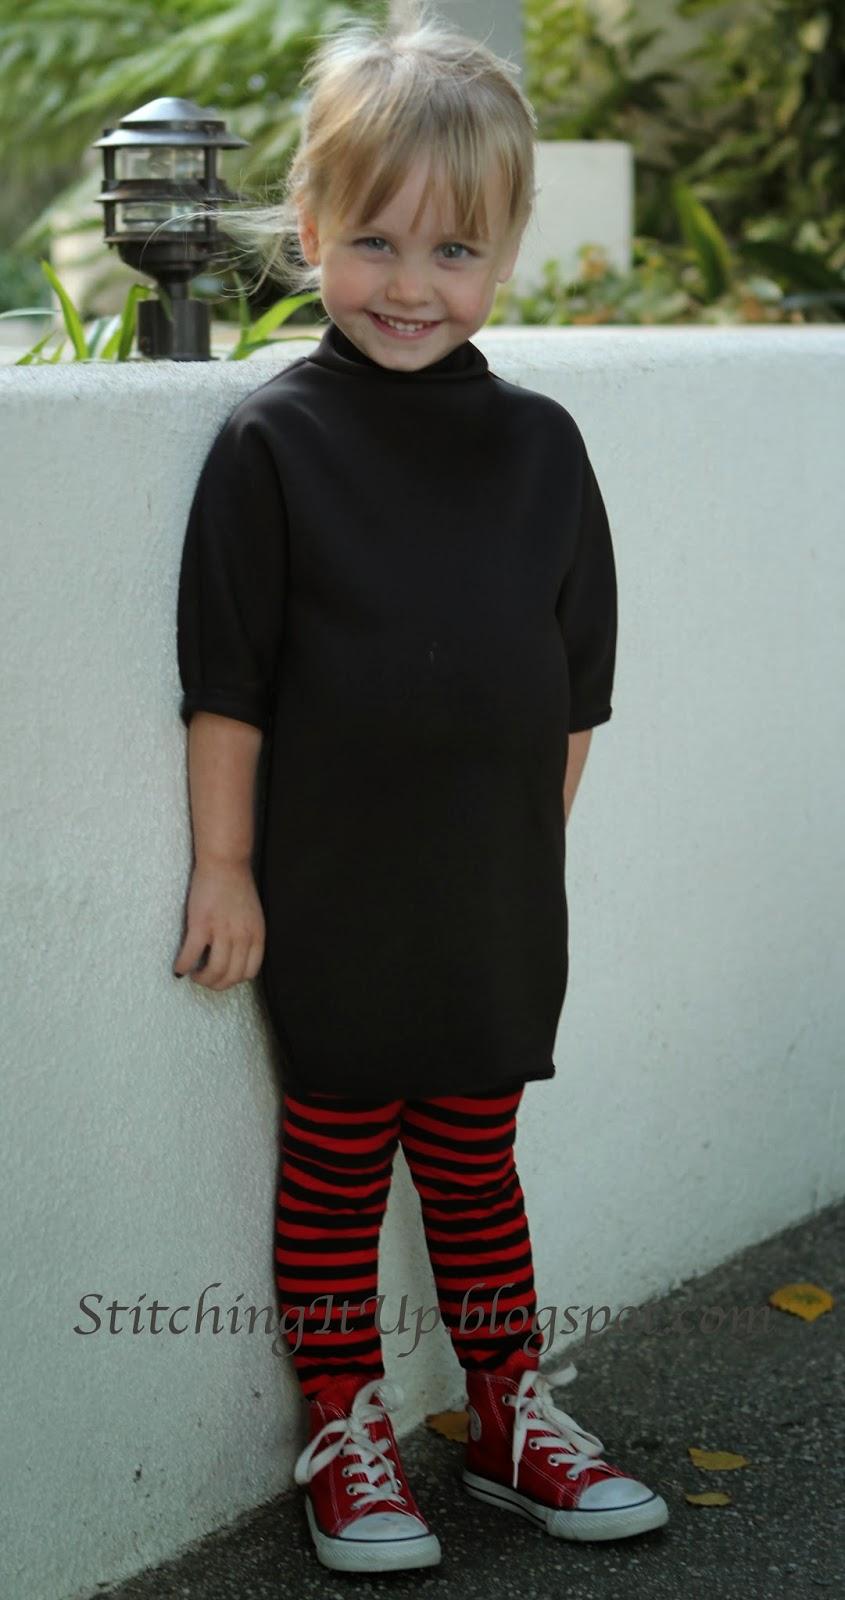 I made the matching Martha Dracula costume for myself to do the mom and me set.  sc 1 st  Stitching It Up & Stitching It Up: Mavis Dracula DIY Costume Hotel Transylvania